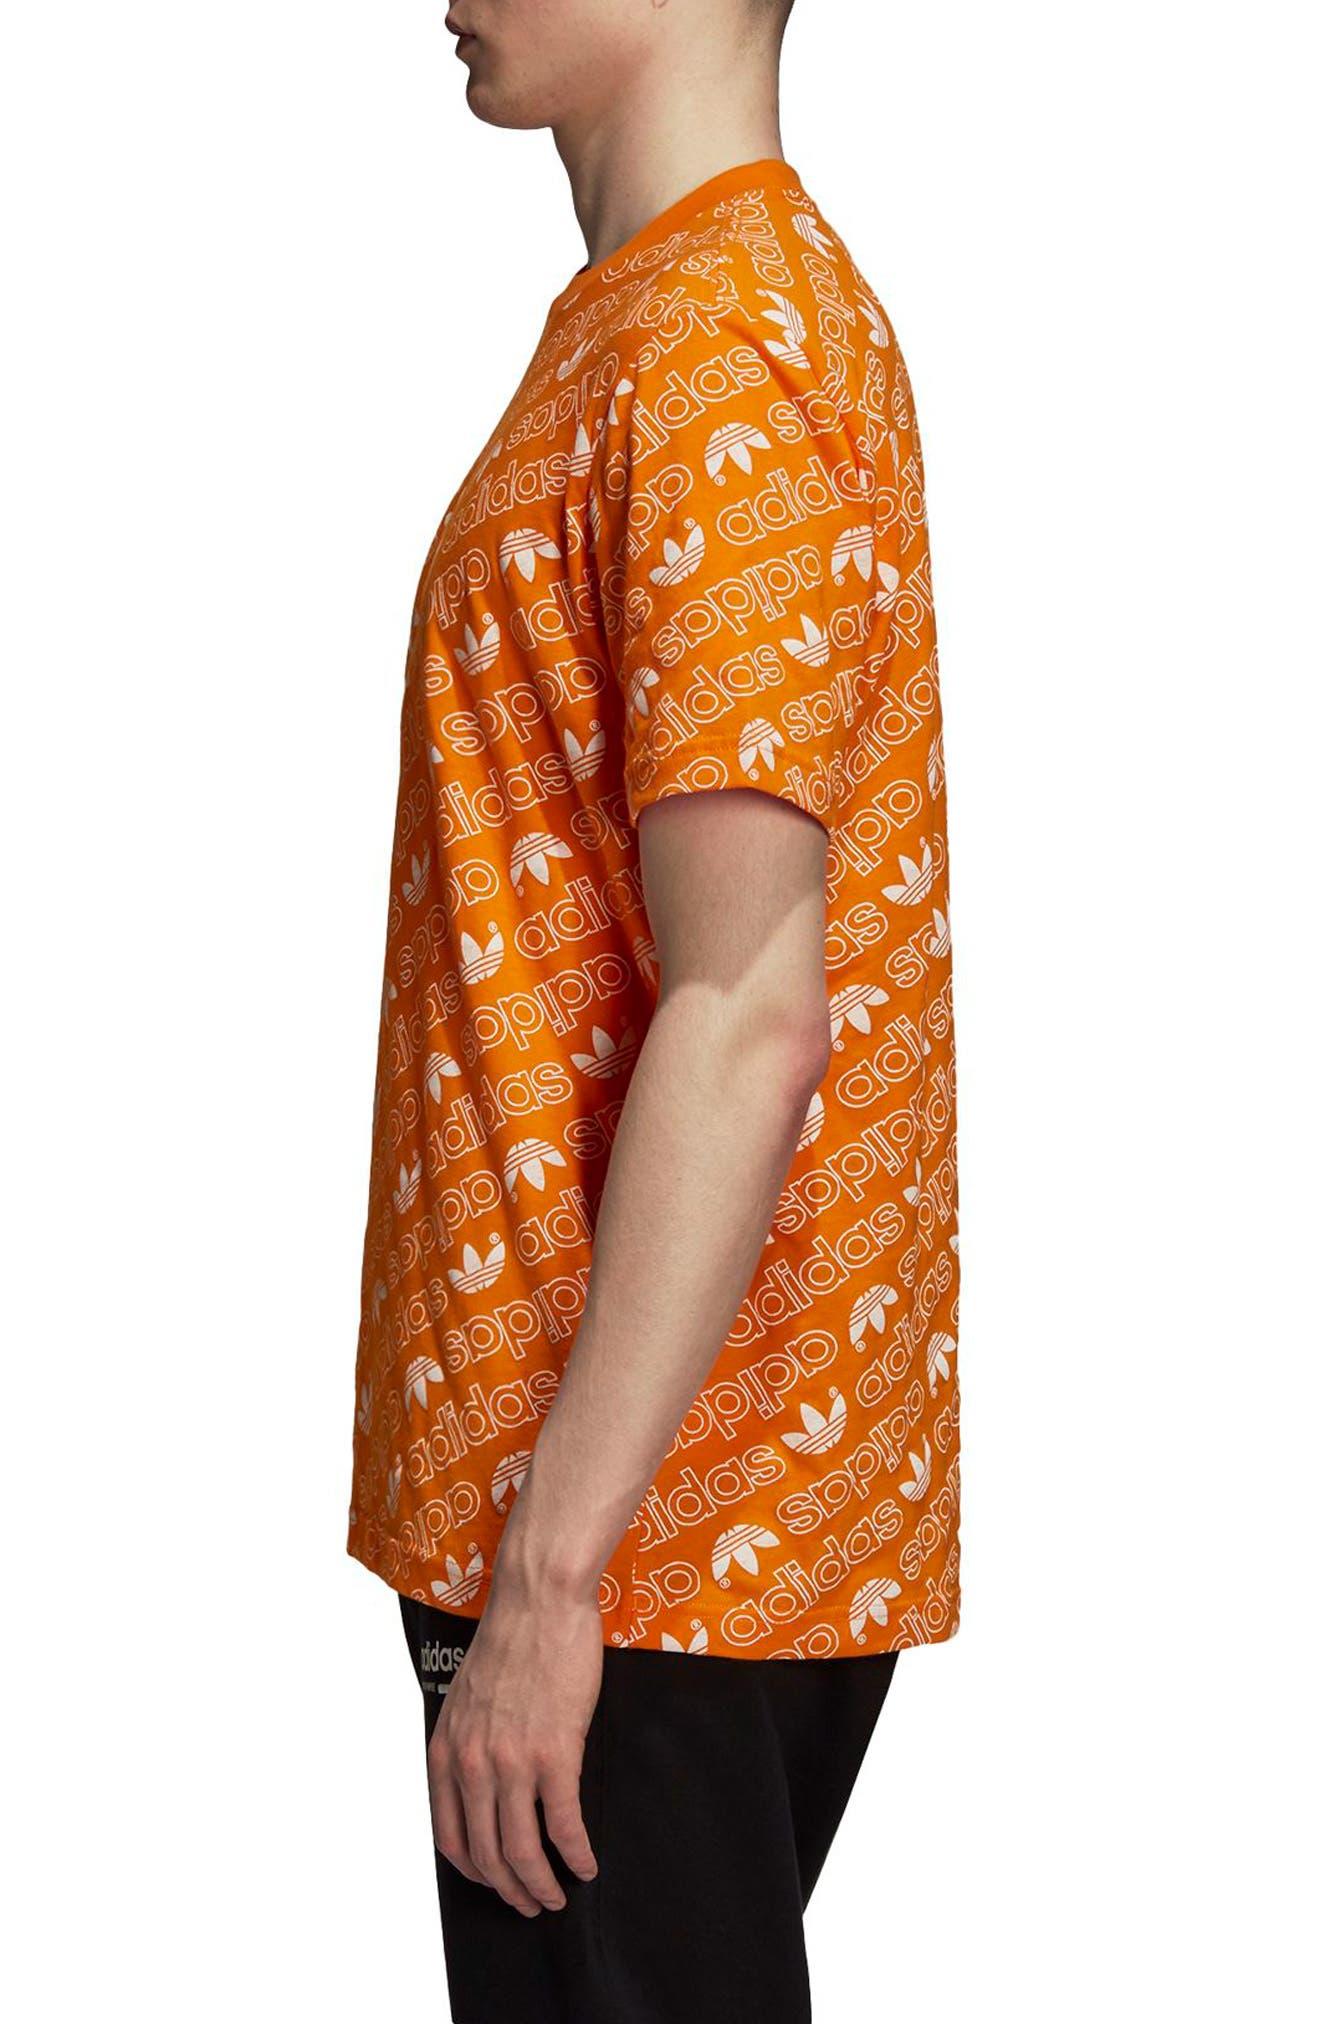 Monogram Allover Print T-Shirt,                             Alternate thumbnail 3, color,                             Bright Orange